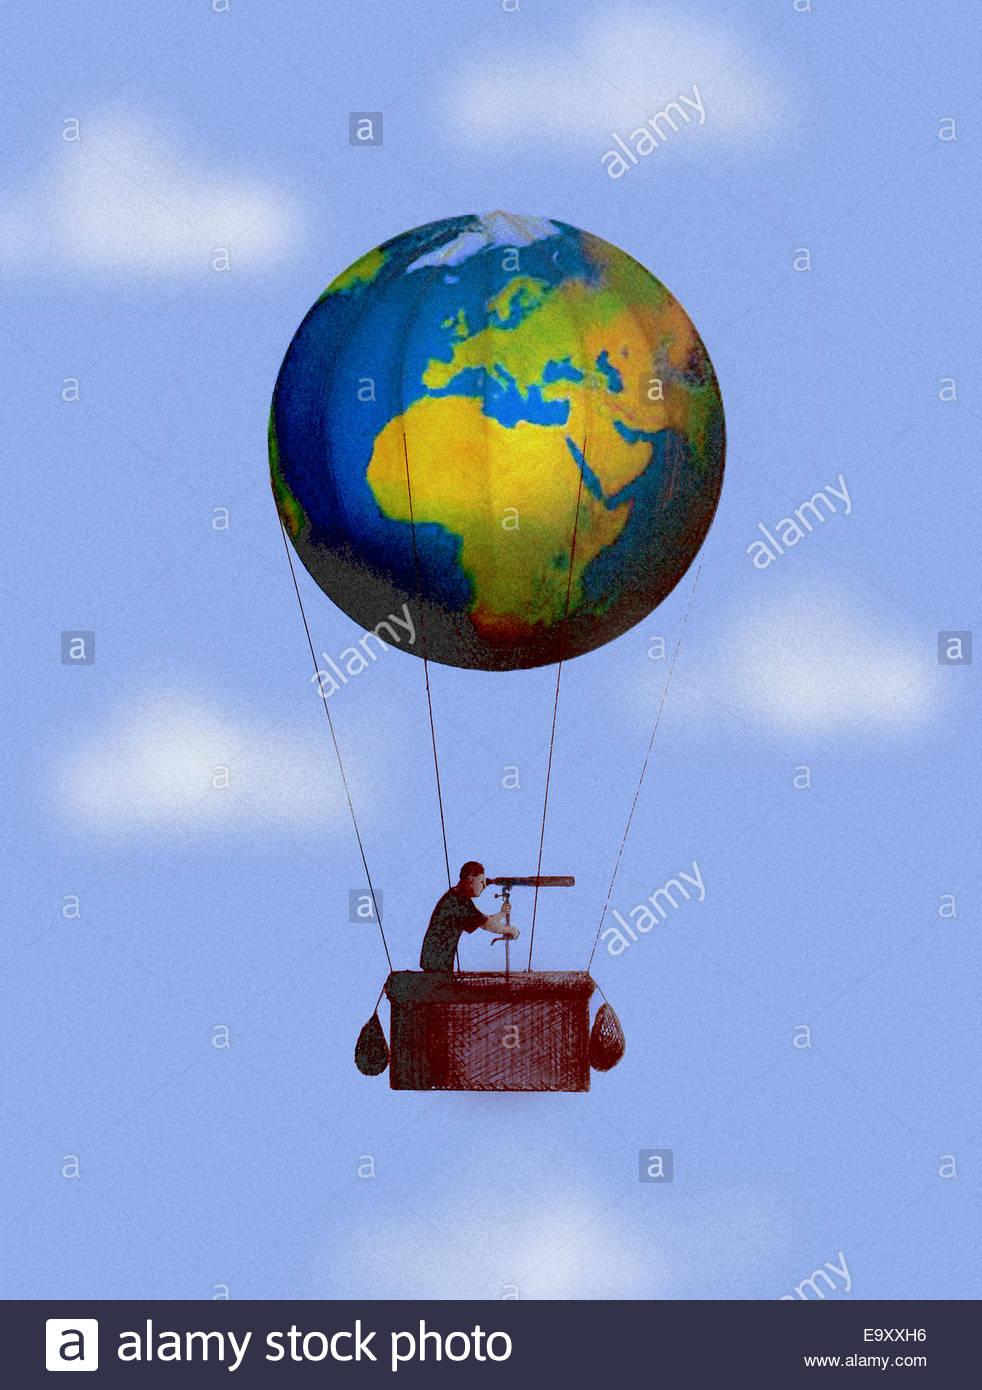 Man looking through telescope dans globe hot air balloon Photo Stock